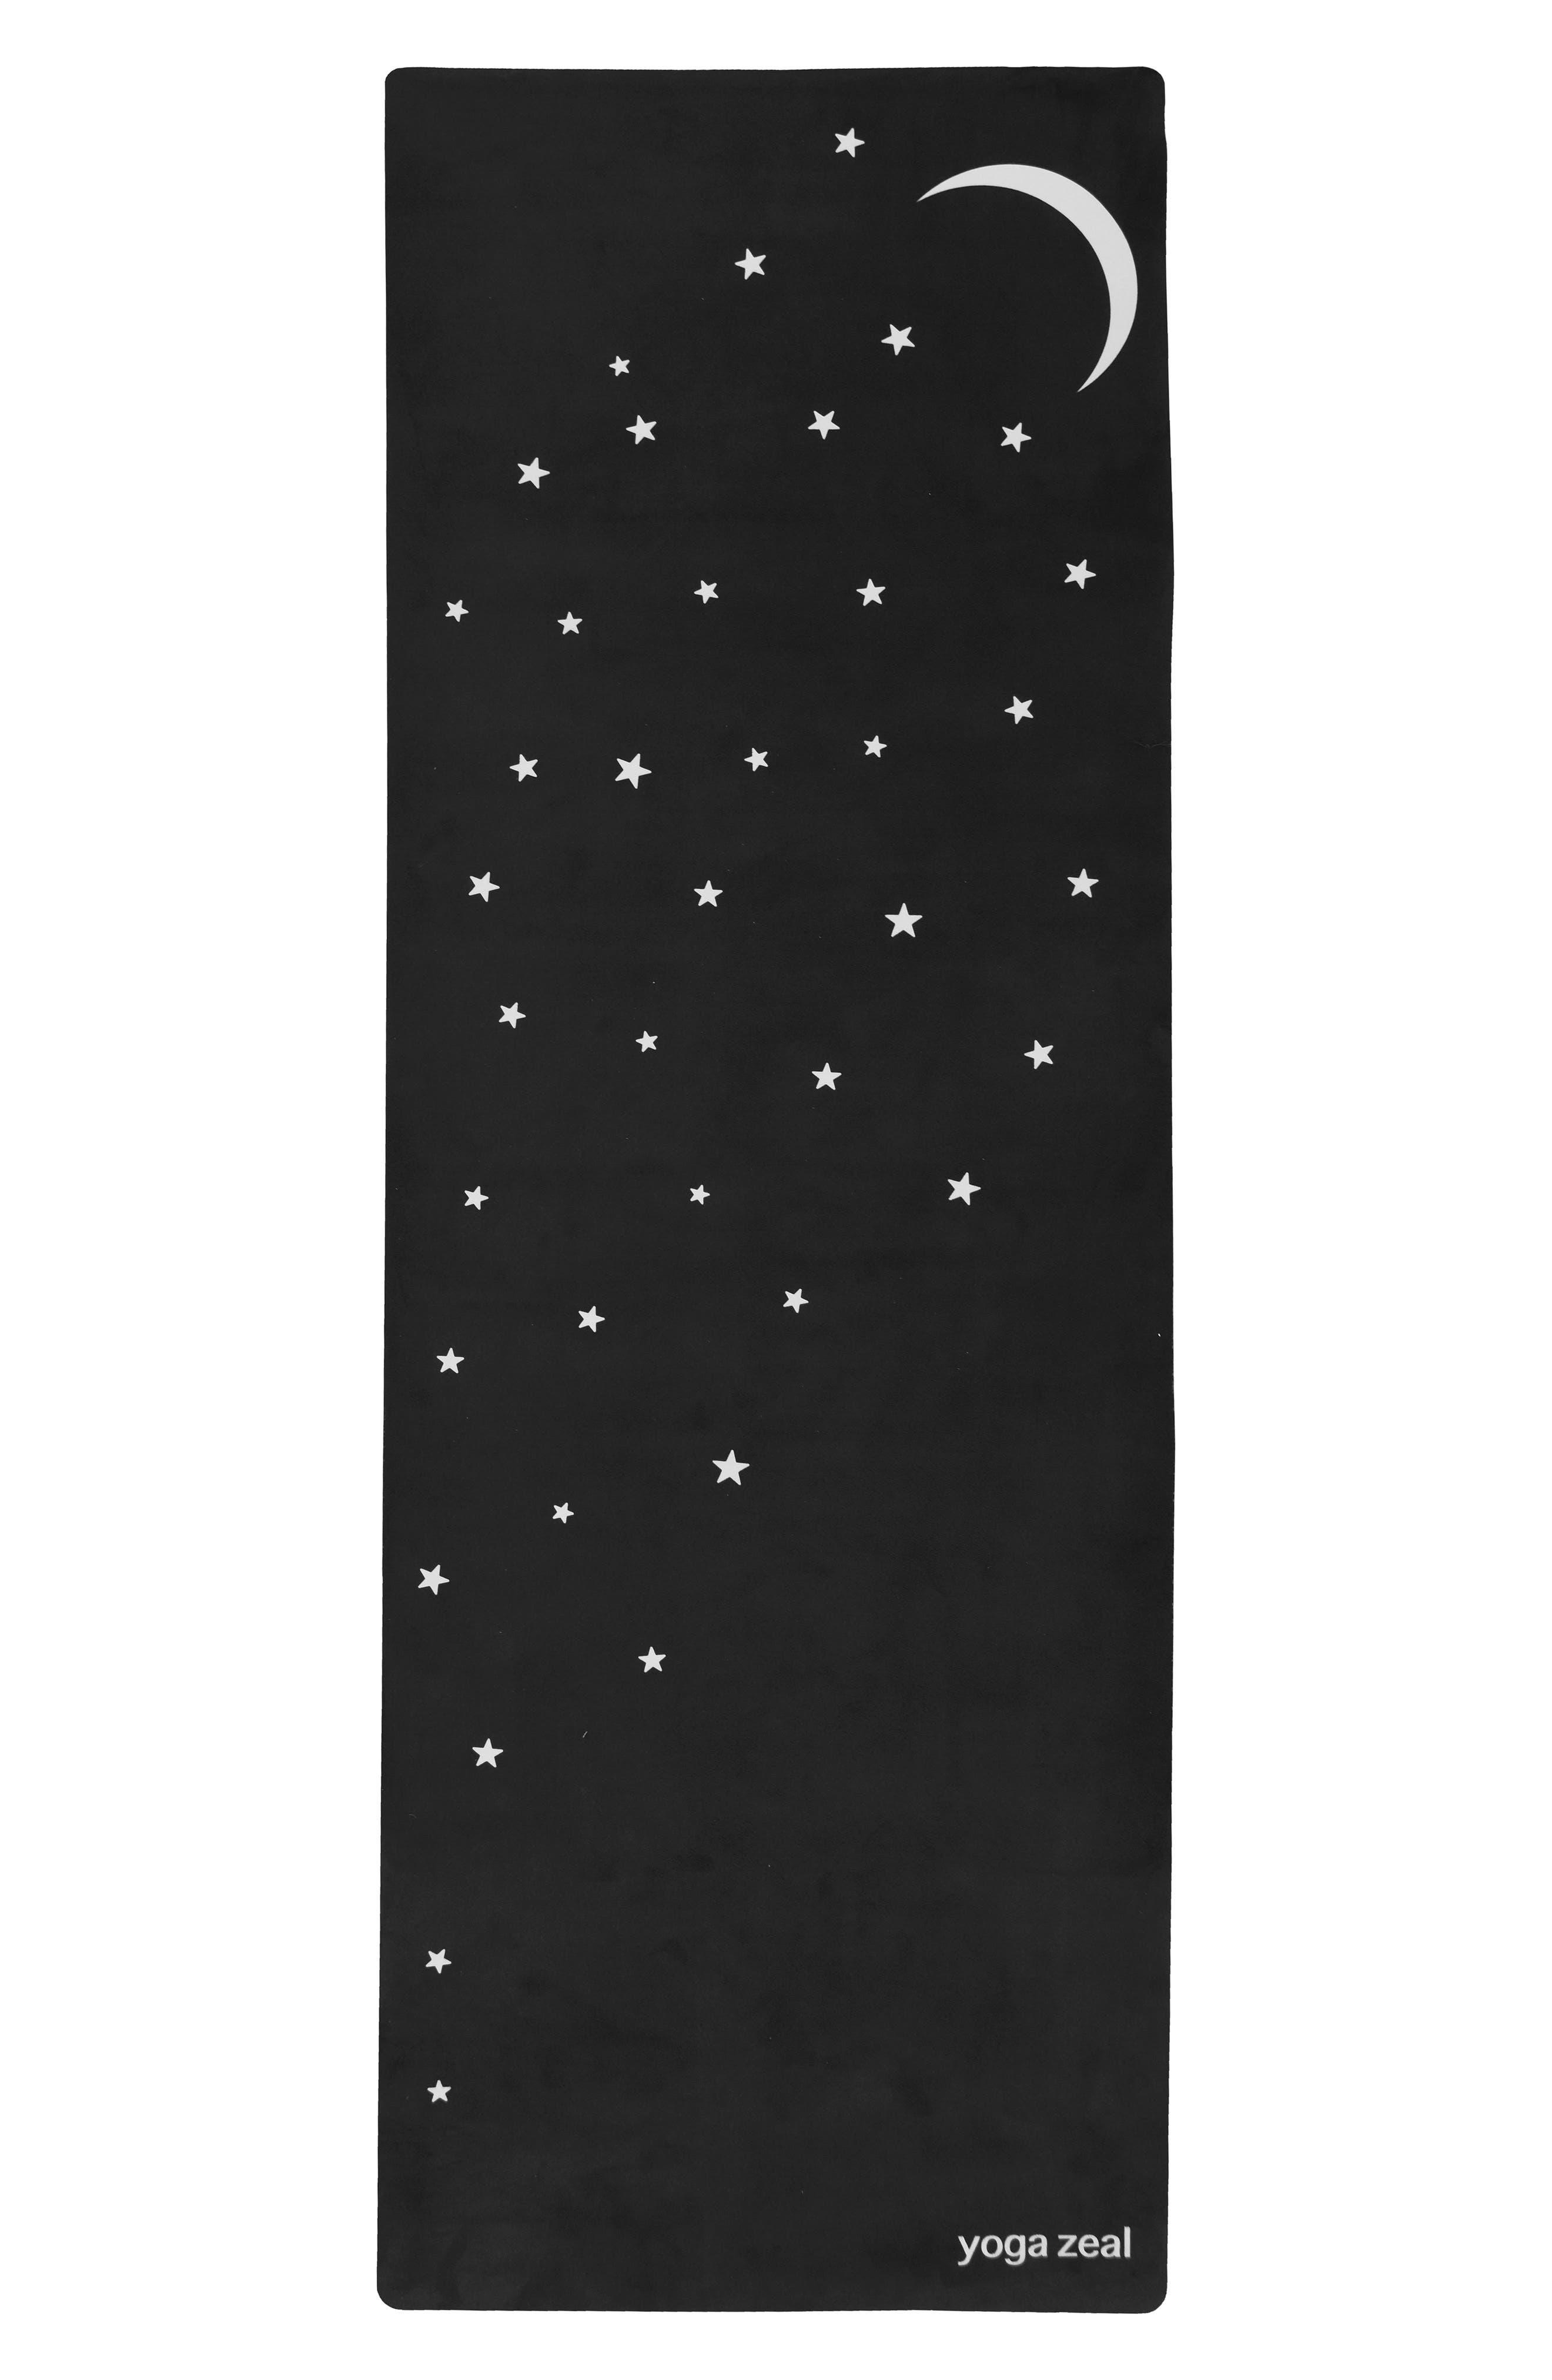 Yoga Zeal Moon & Stars Print Yoga Mat